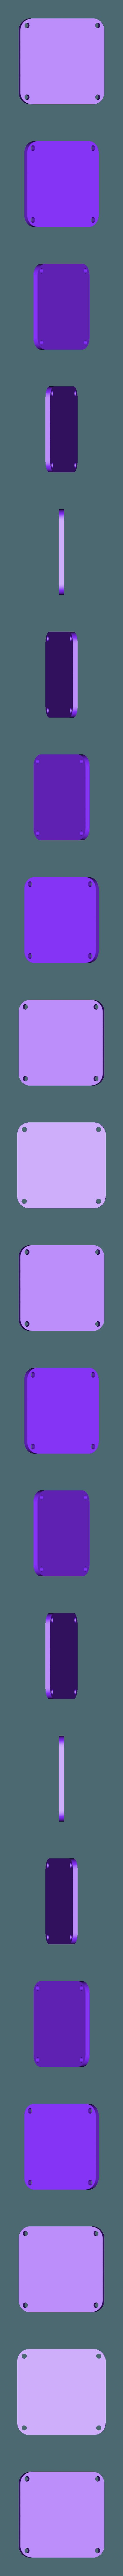 Housing Cam glass.STL Download free STL file Pi - iP Cam • Model to 3D print, Bishop